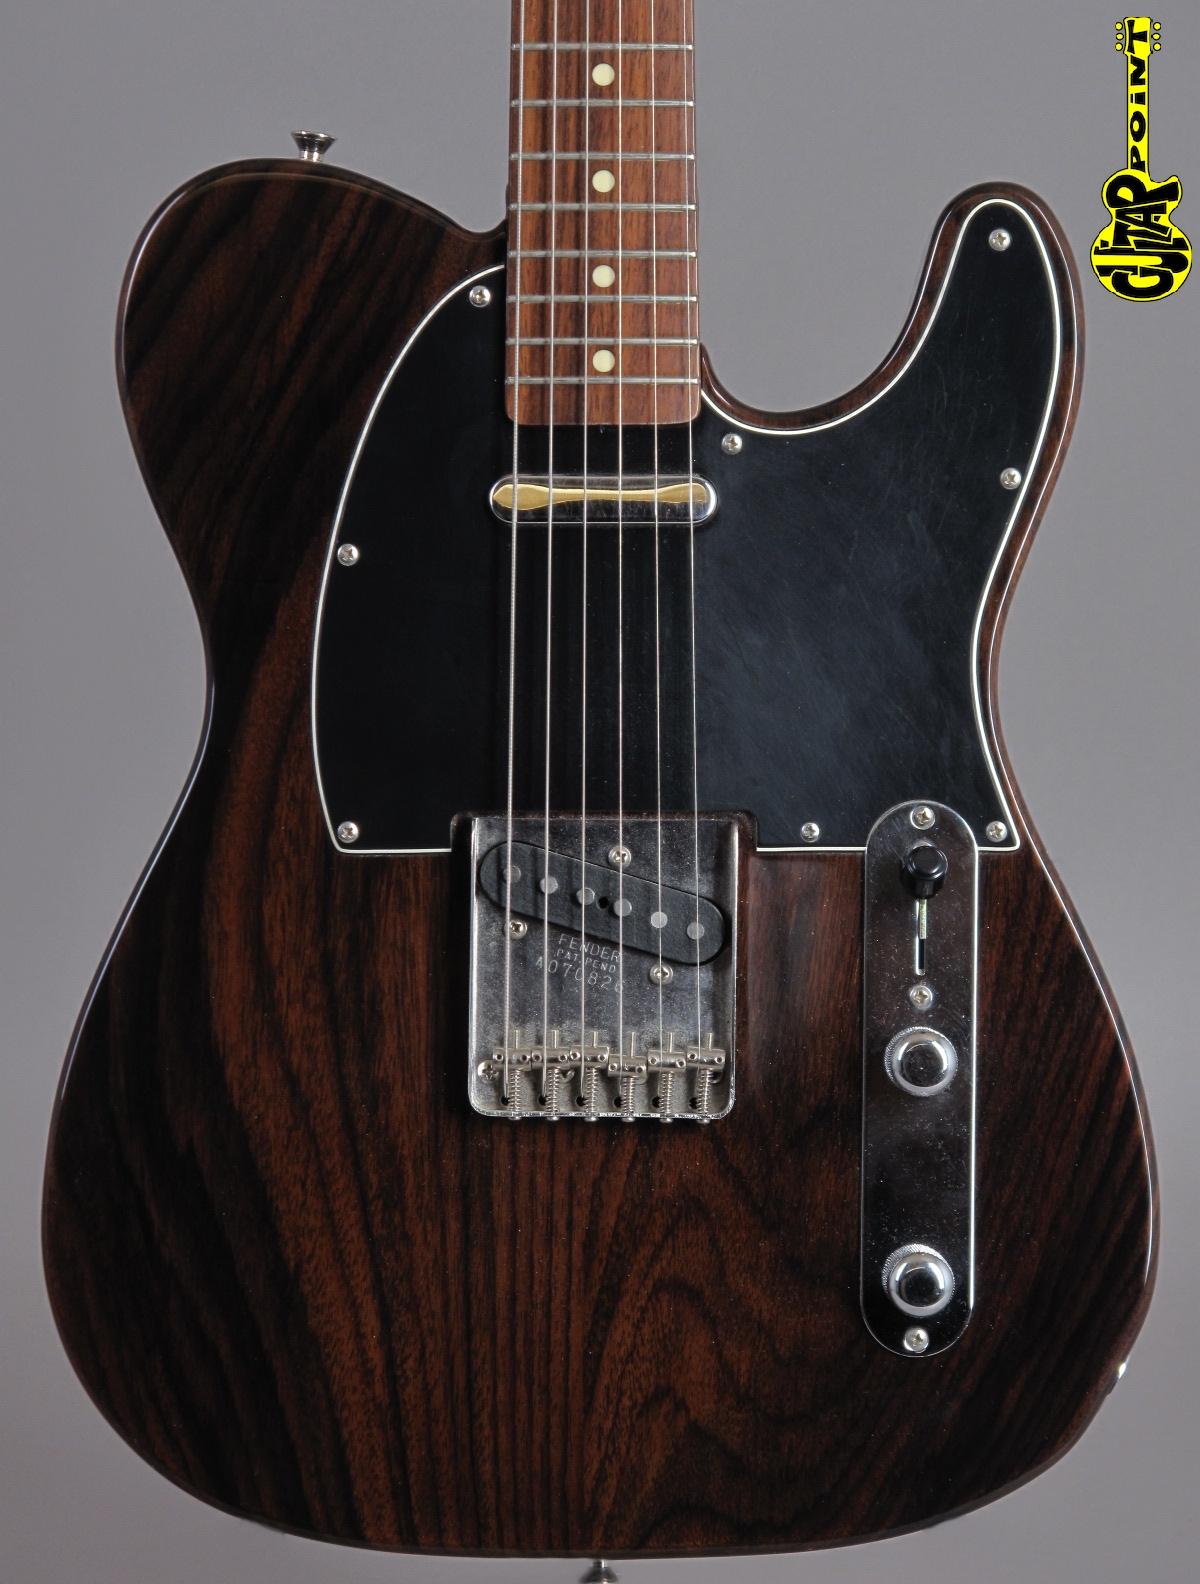 1996 Fender Rosewood MIJ Telecaster - Natural